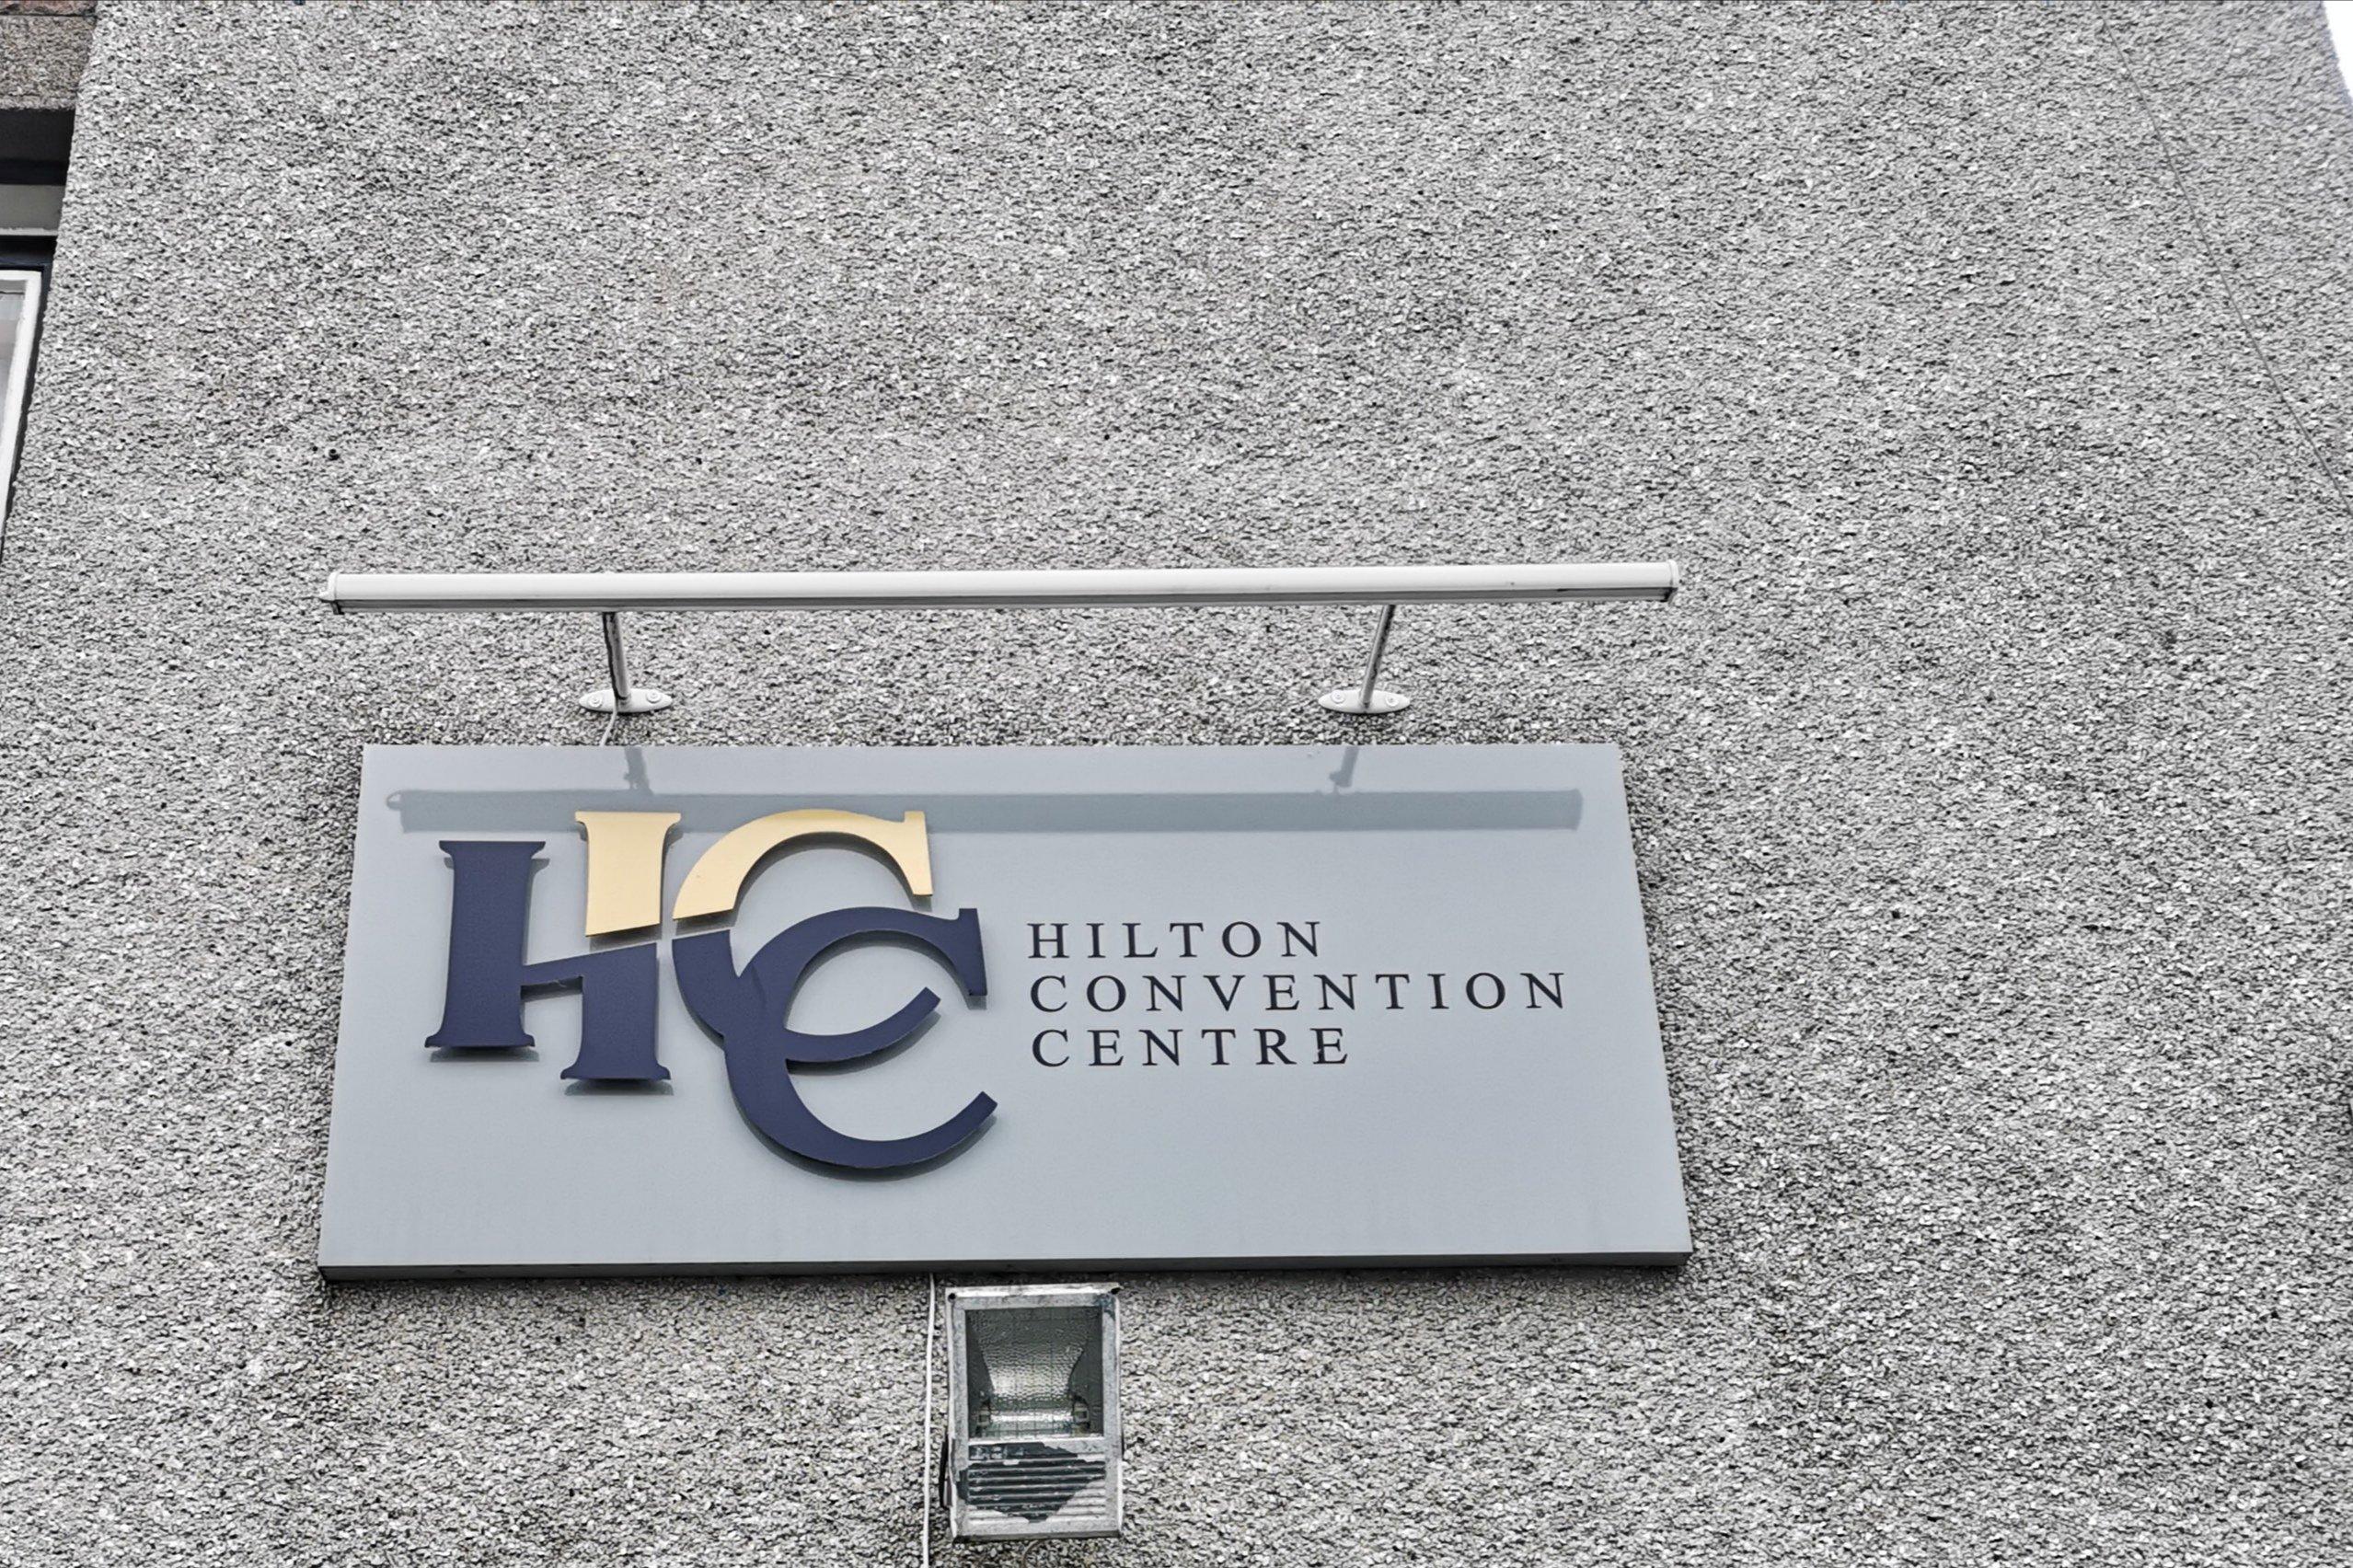 Hilton Convention Centre, Aberdeen